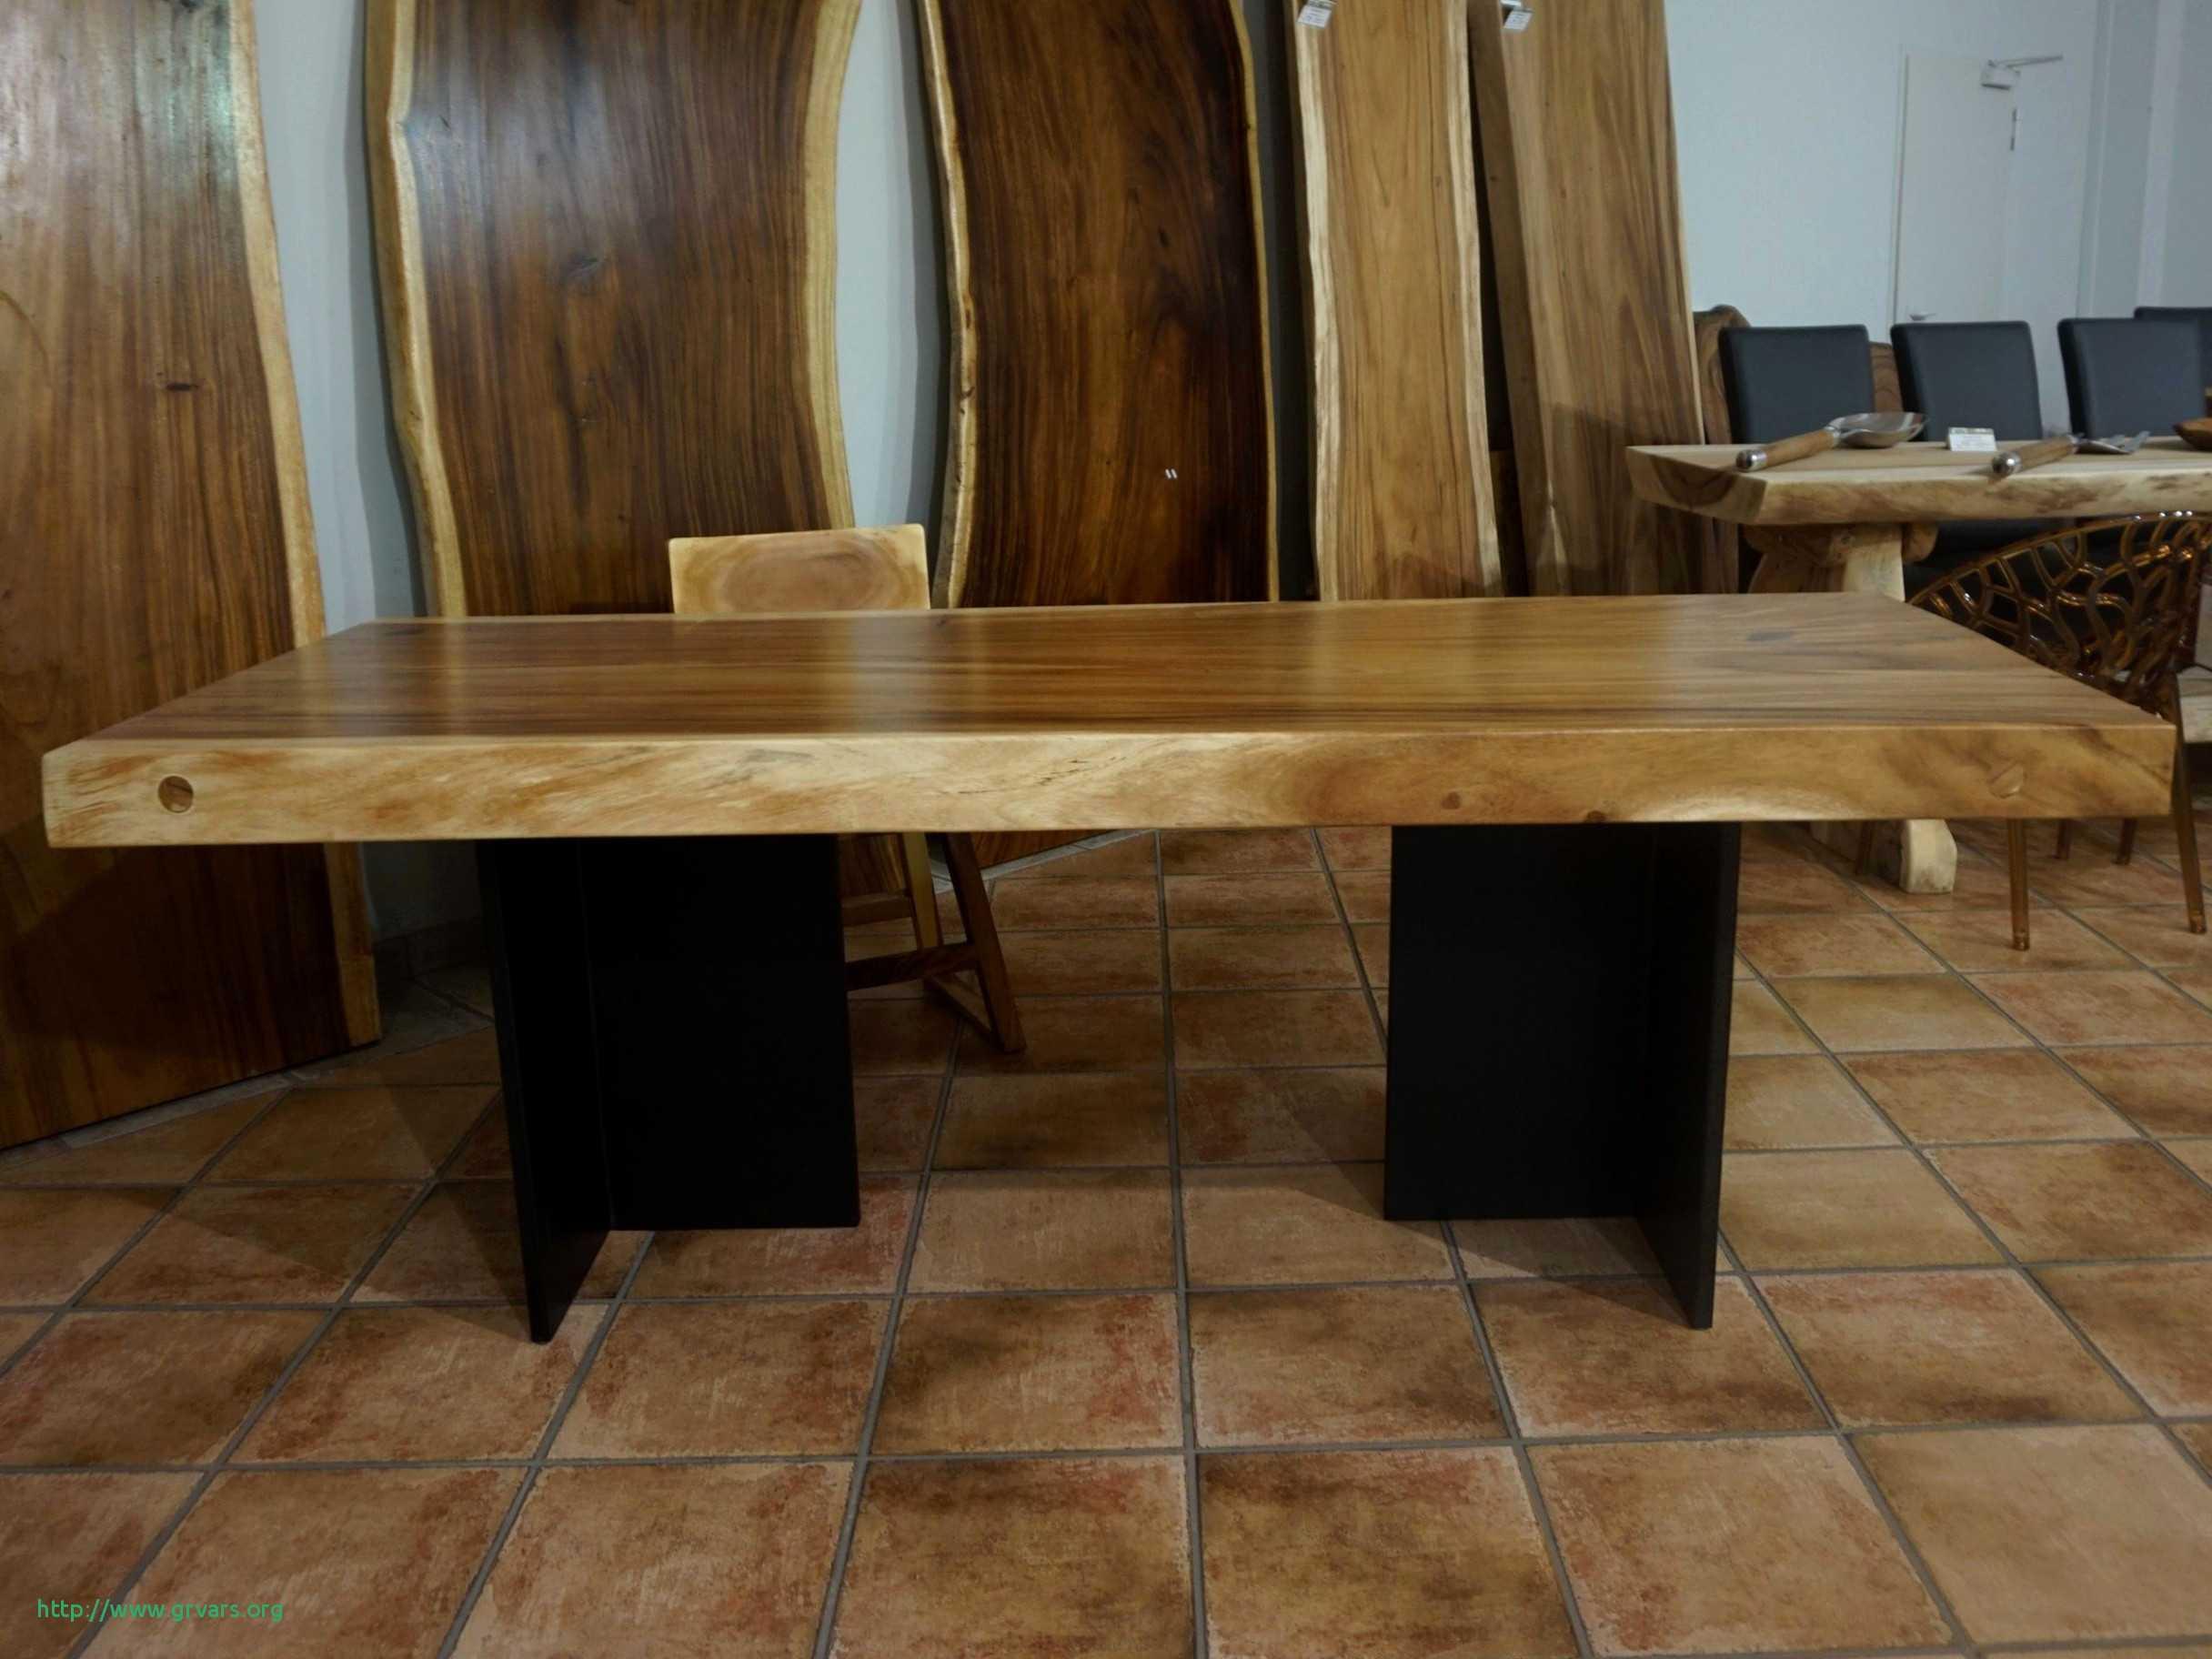 herringbone hardwood floor installation cost of plywood hardwood floors 17 frais cost to replace flooring in home with plywood hardwood floors 17 frais cost to replace flooring in home